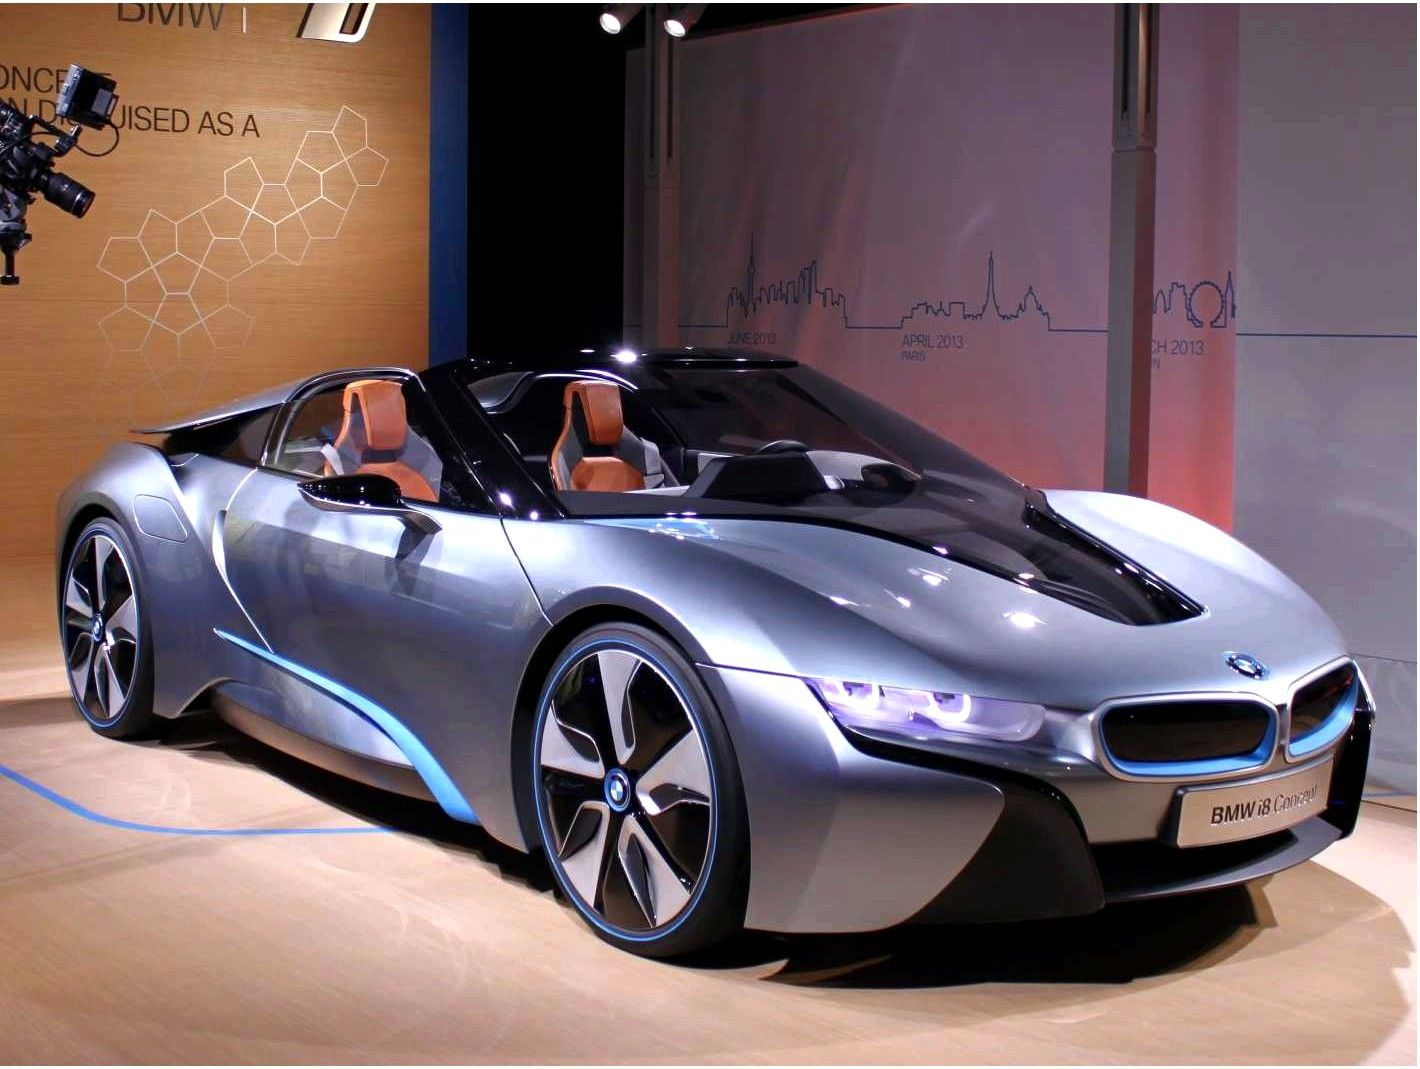 Luxury Electric Cars Luxury Electric Cars Coming From Bmw Rolls Royce Tesla Best Electric Car Electric Car Concept Electric Cars